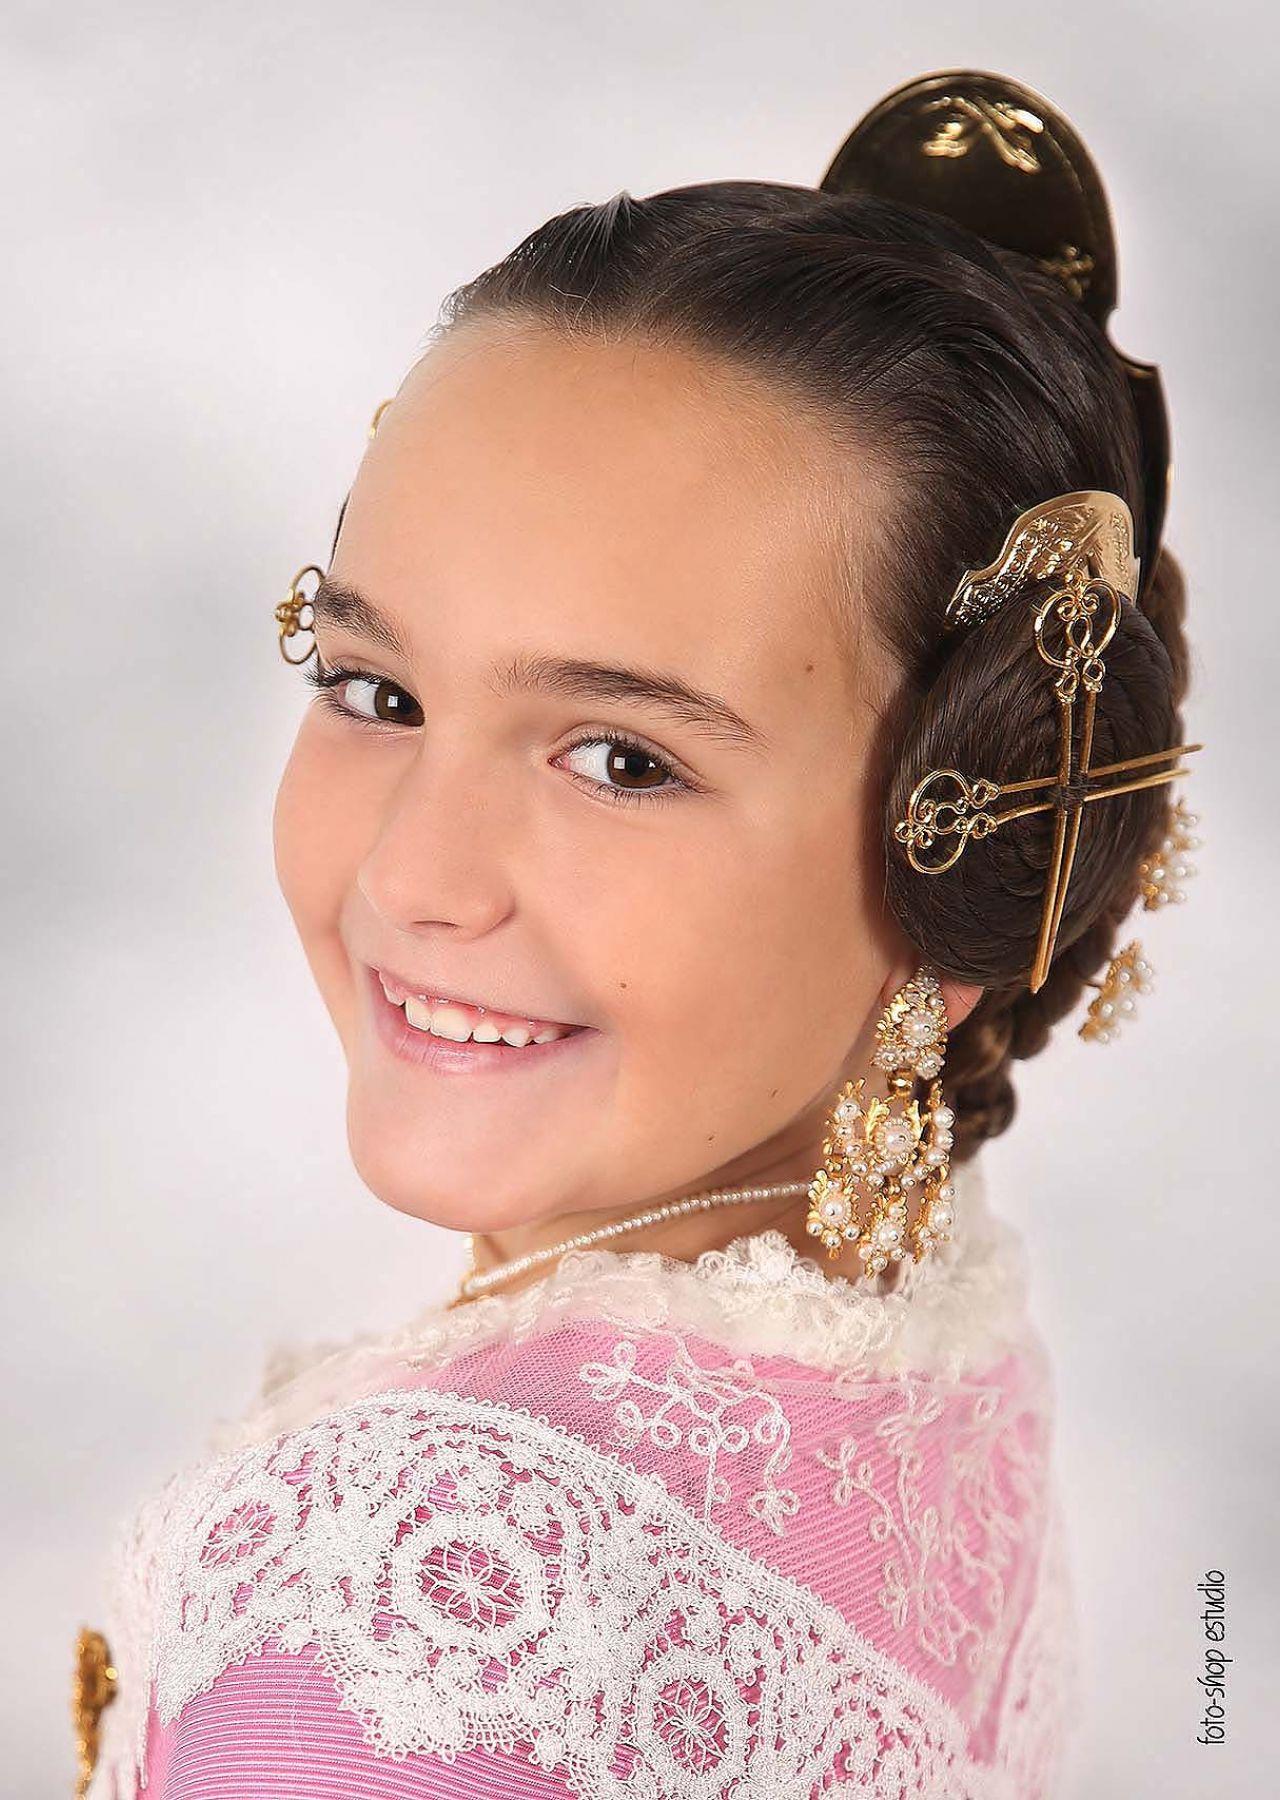 Ariadna Palanca Soler